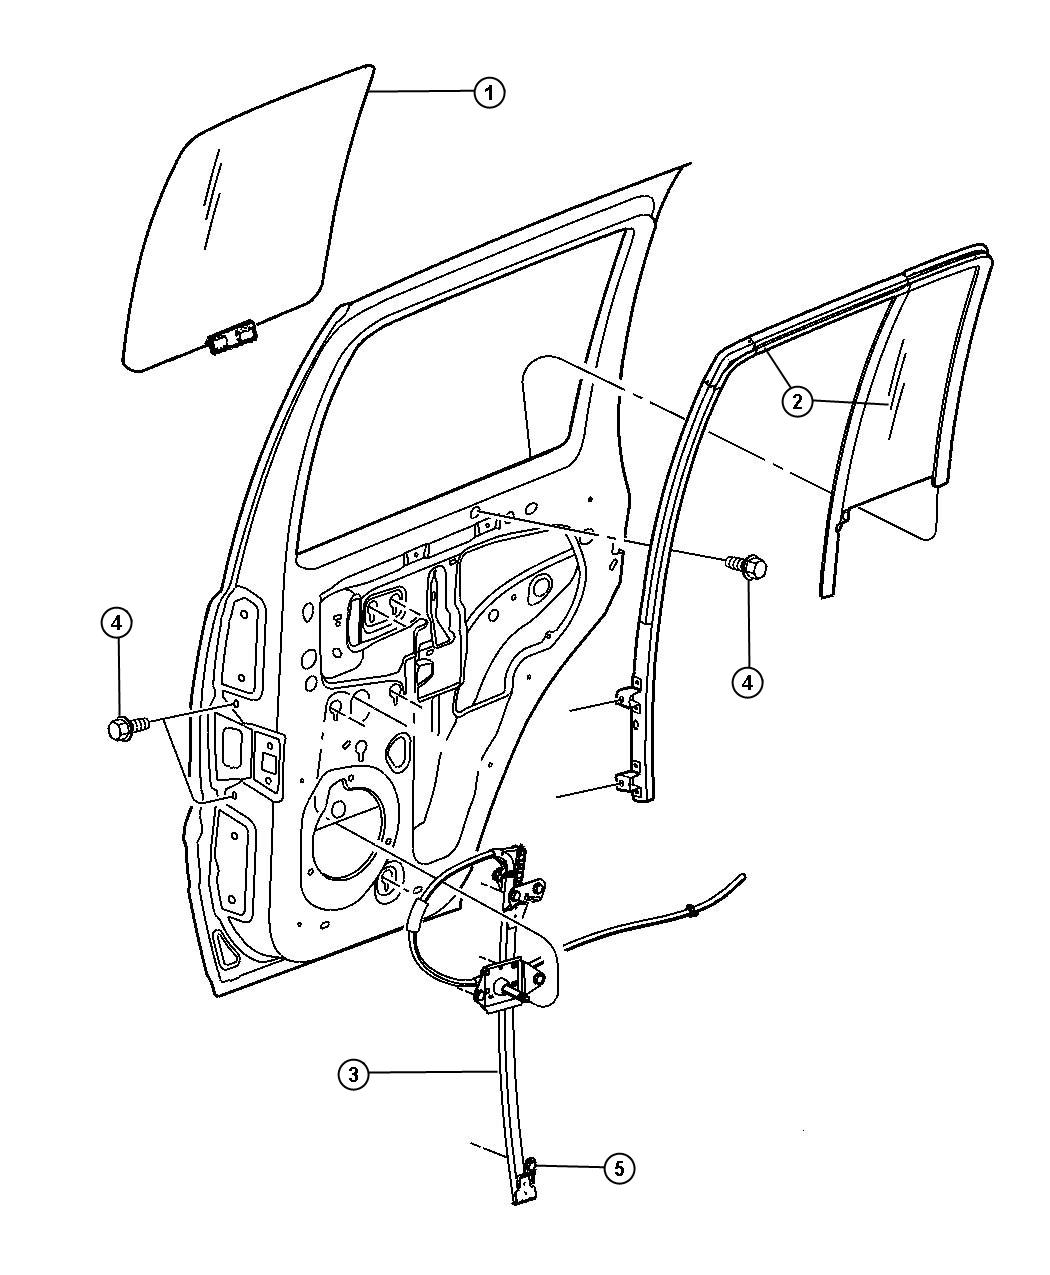 Jeep Grand Cherokee Window Regulator Diagram